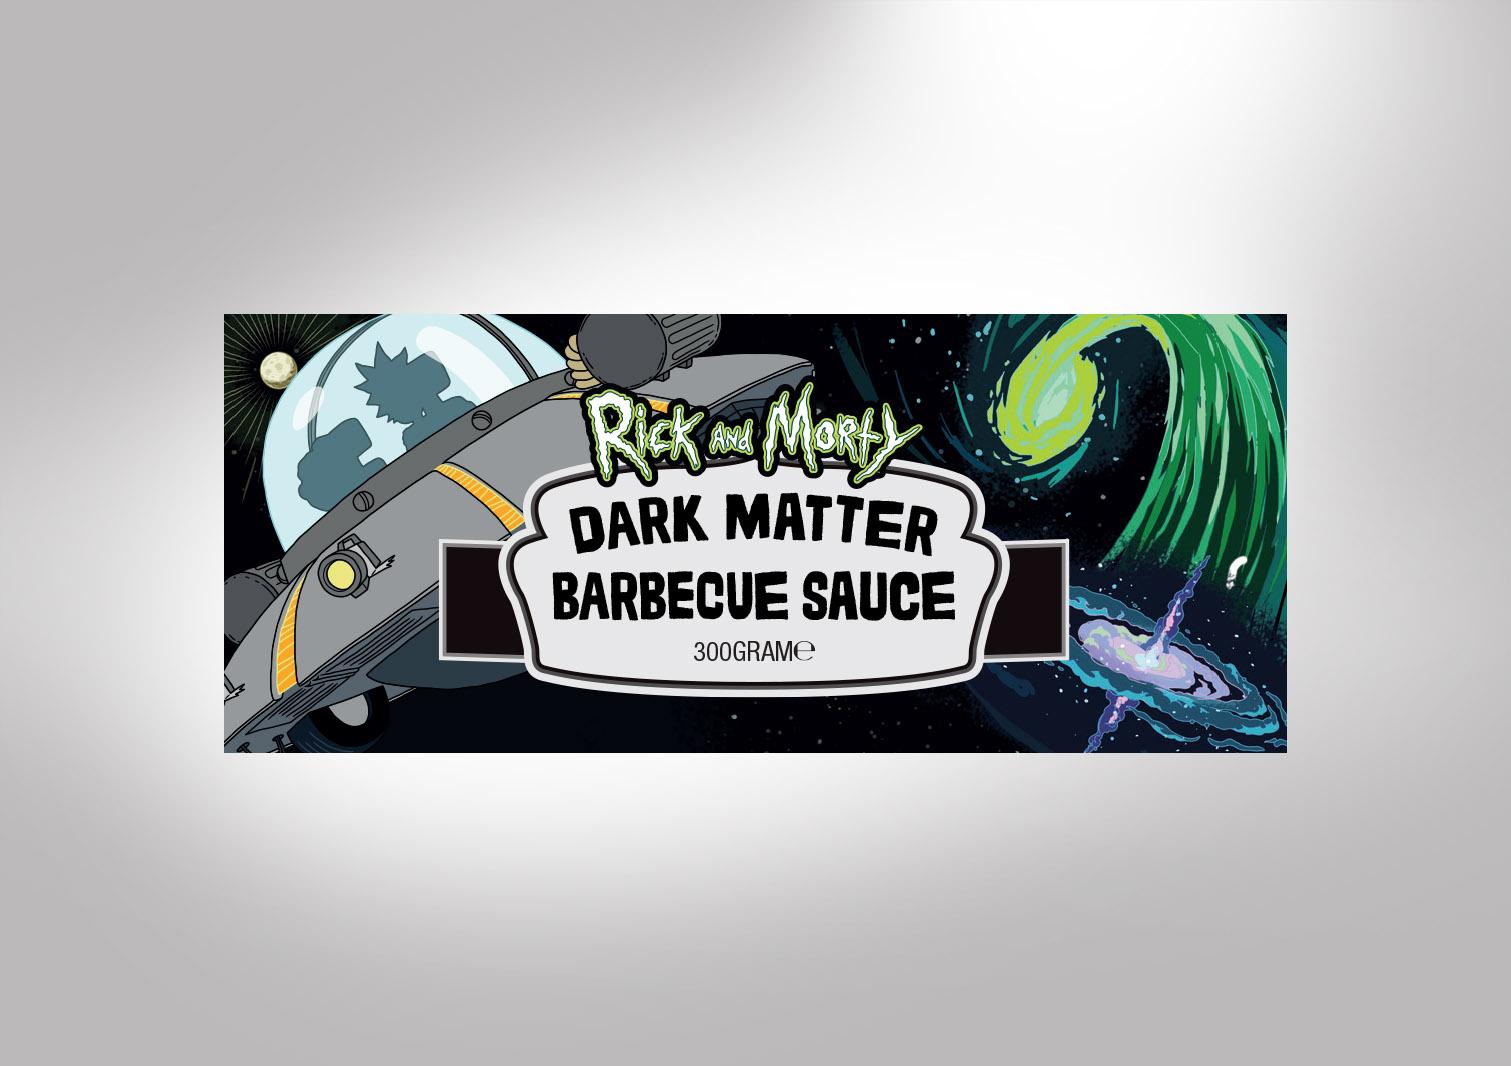 Dark Matter Barbecue Sauce Labeled Jar